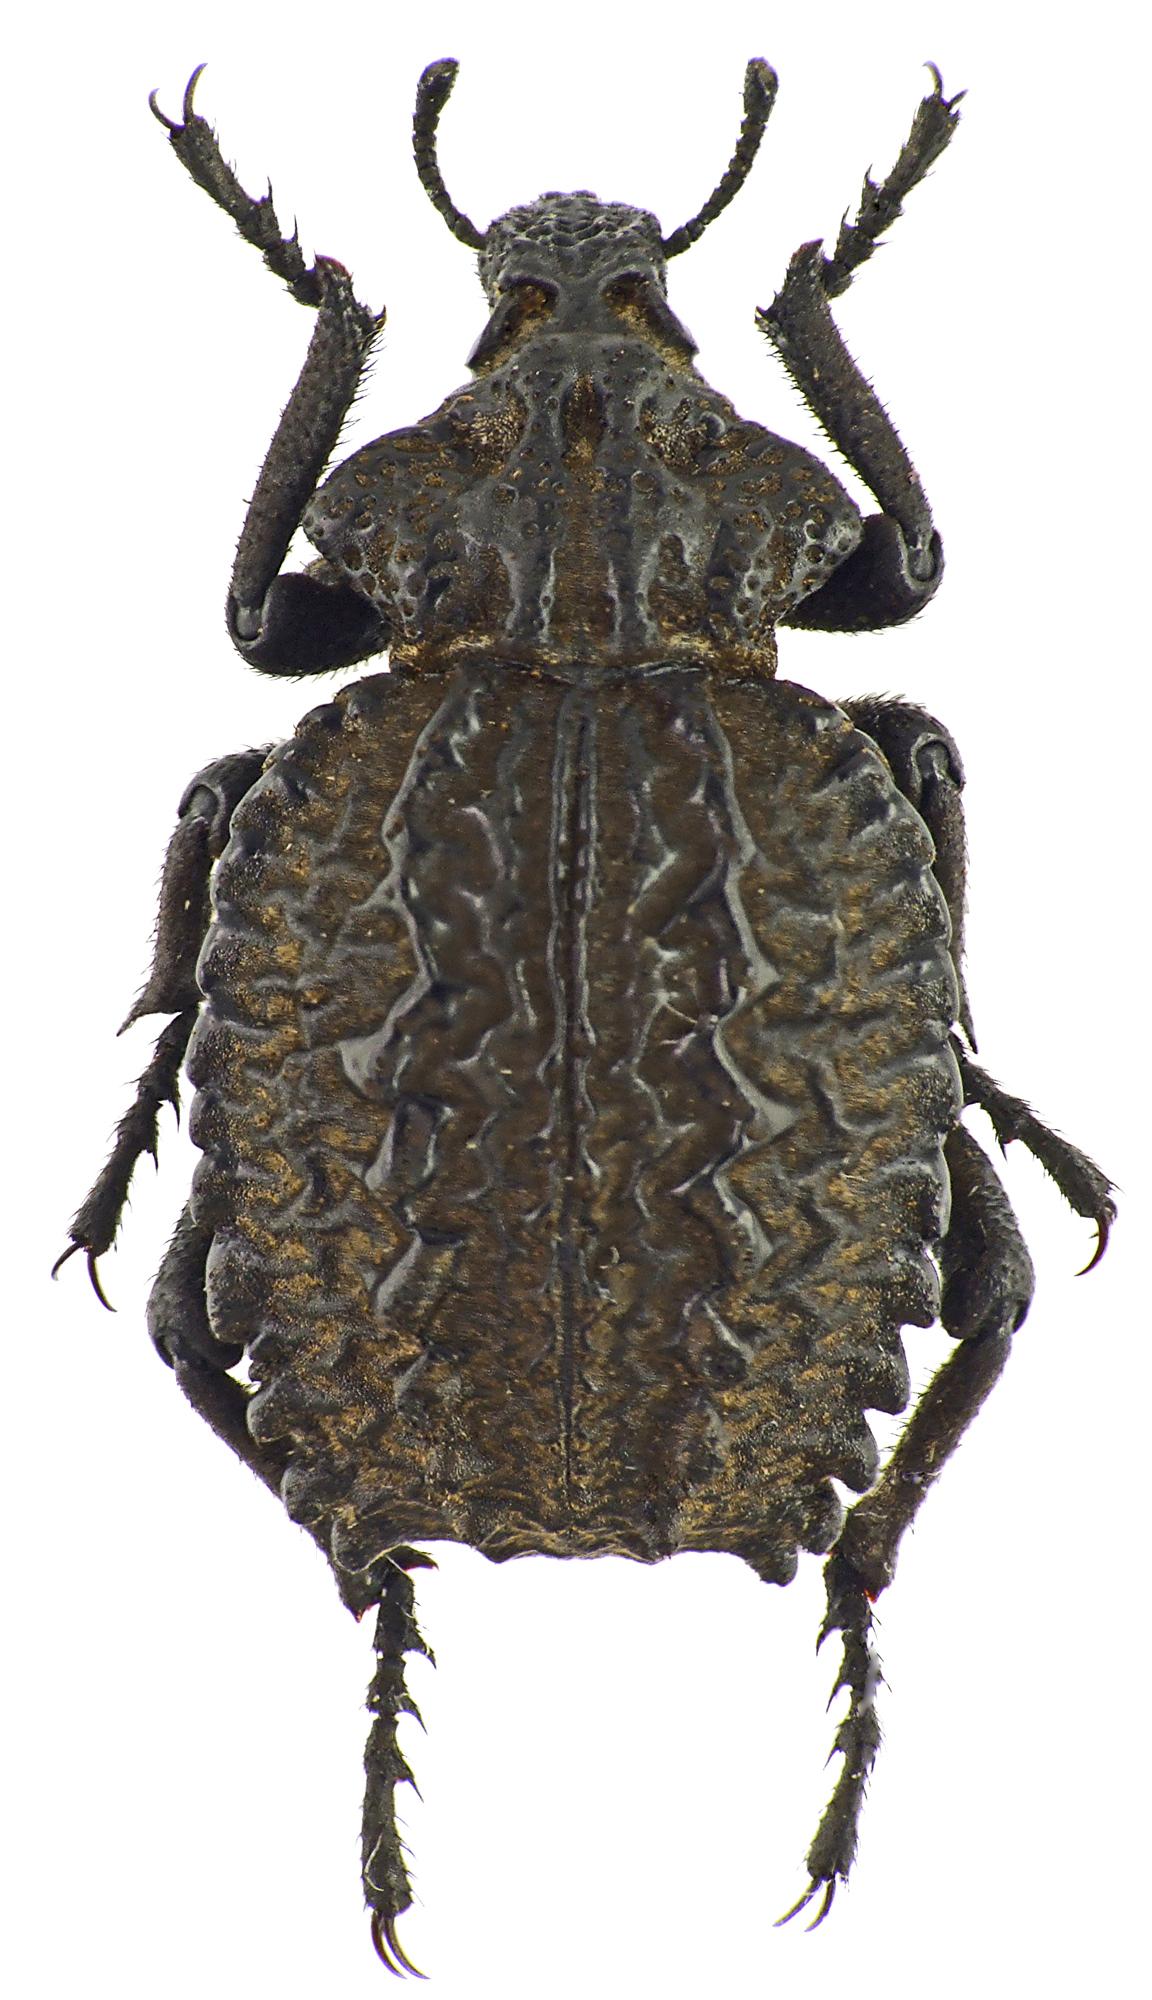 Brachycerus undatus 39078cz85.jpg